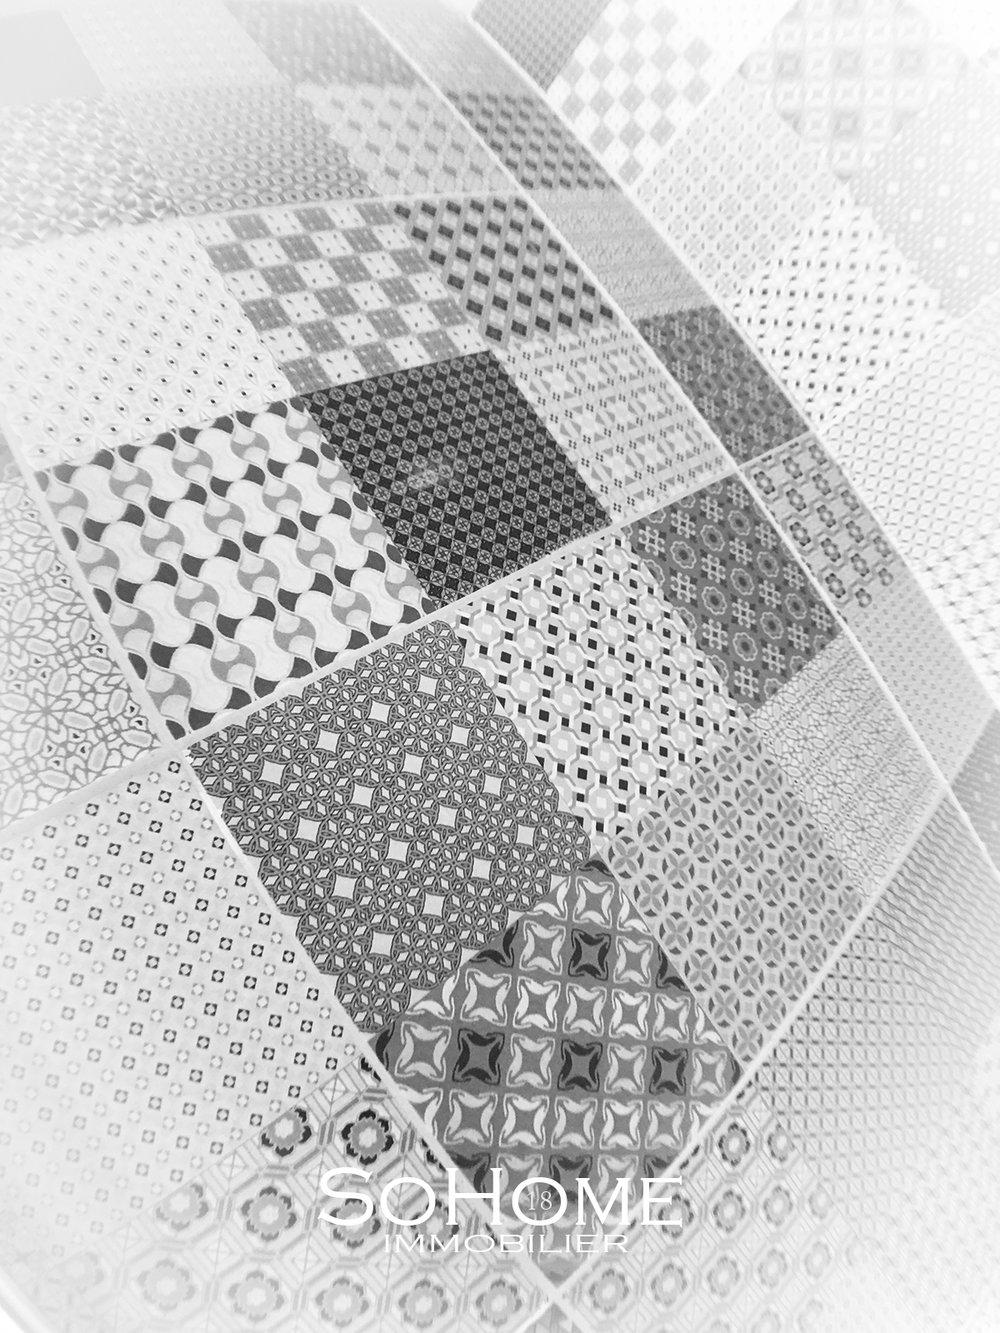 SoHome-PHENIX-17.jpg